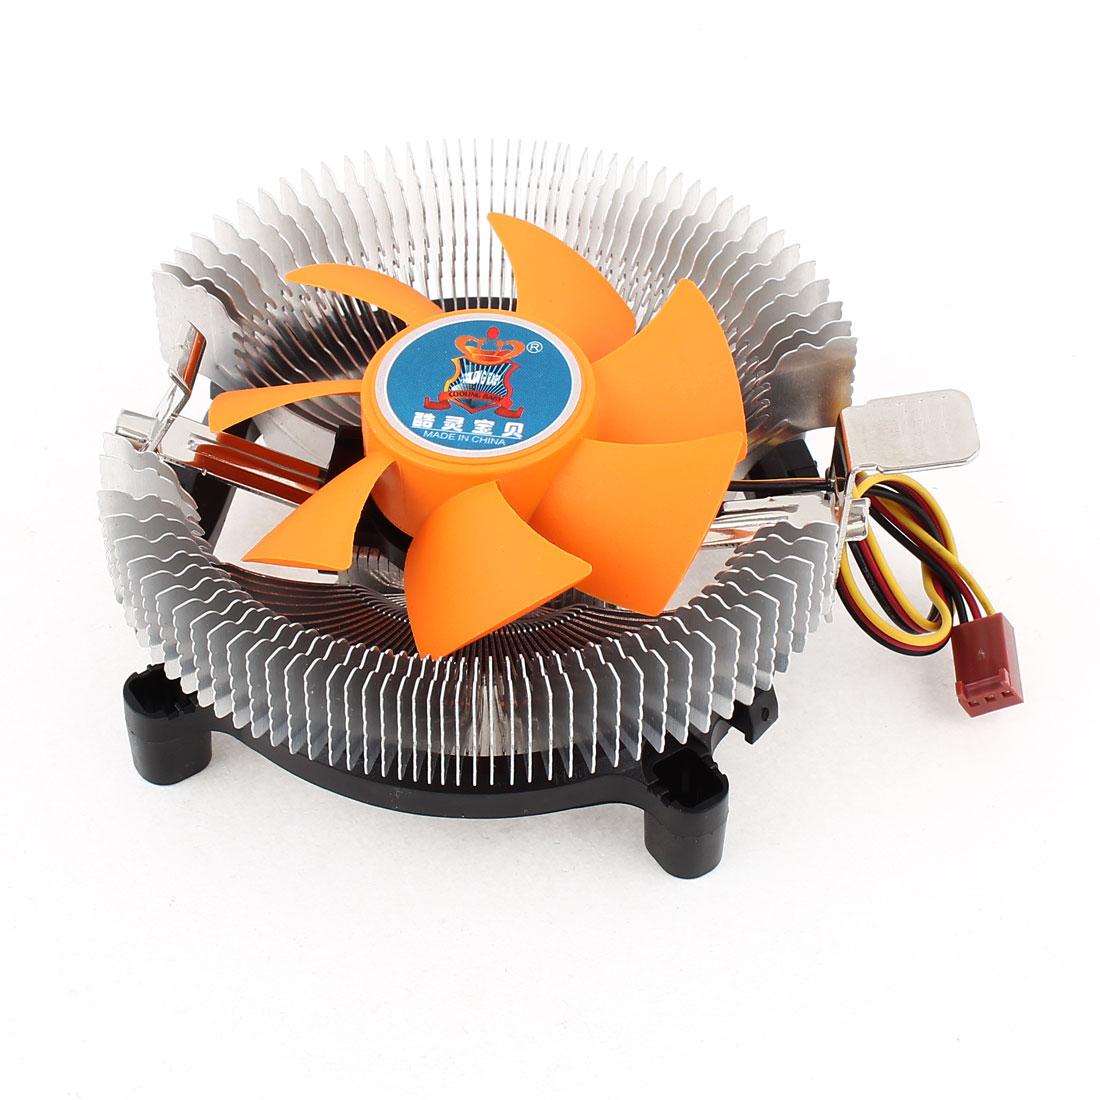 Desktop PC Cooling Fan Heatsink CPU Cooler DC 12V for Intel LGA 775 AMD AM2 AM3